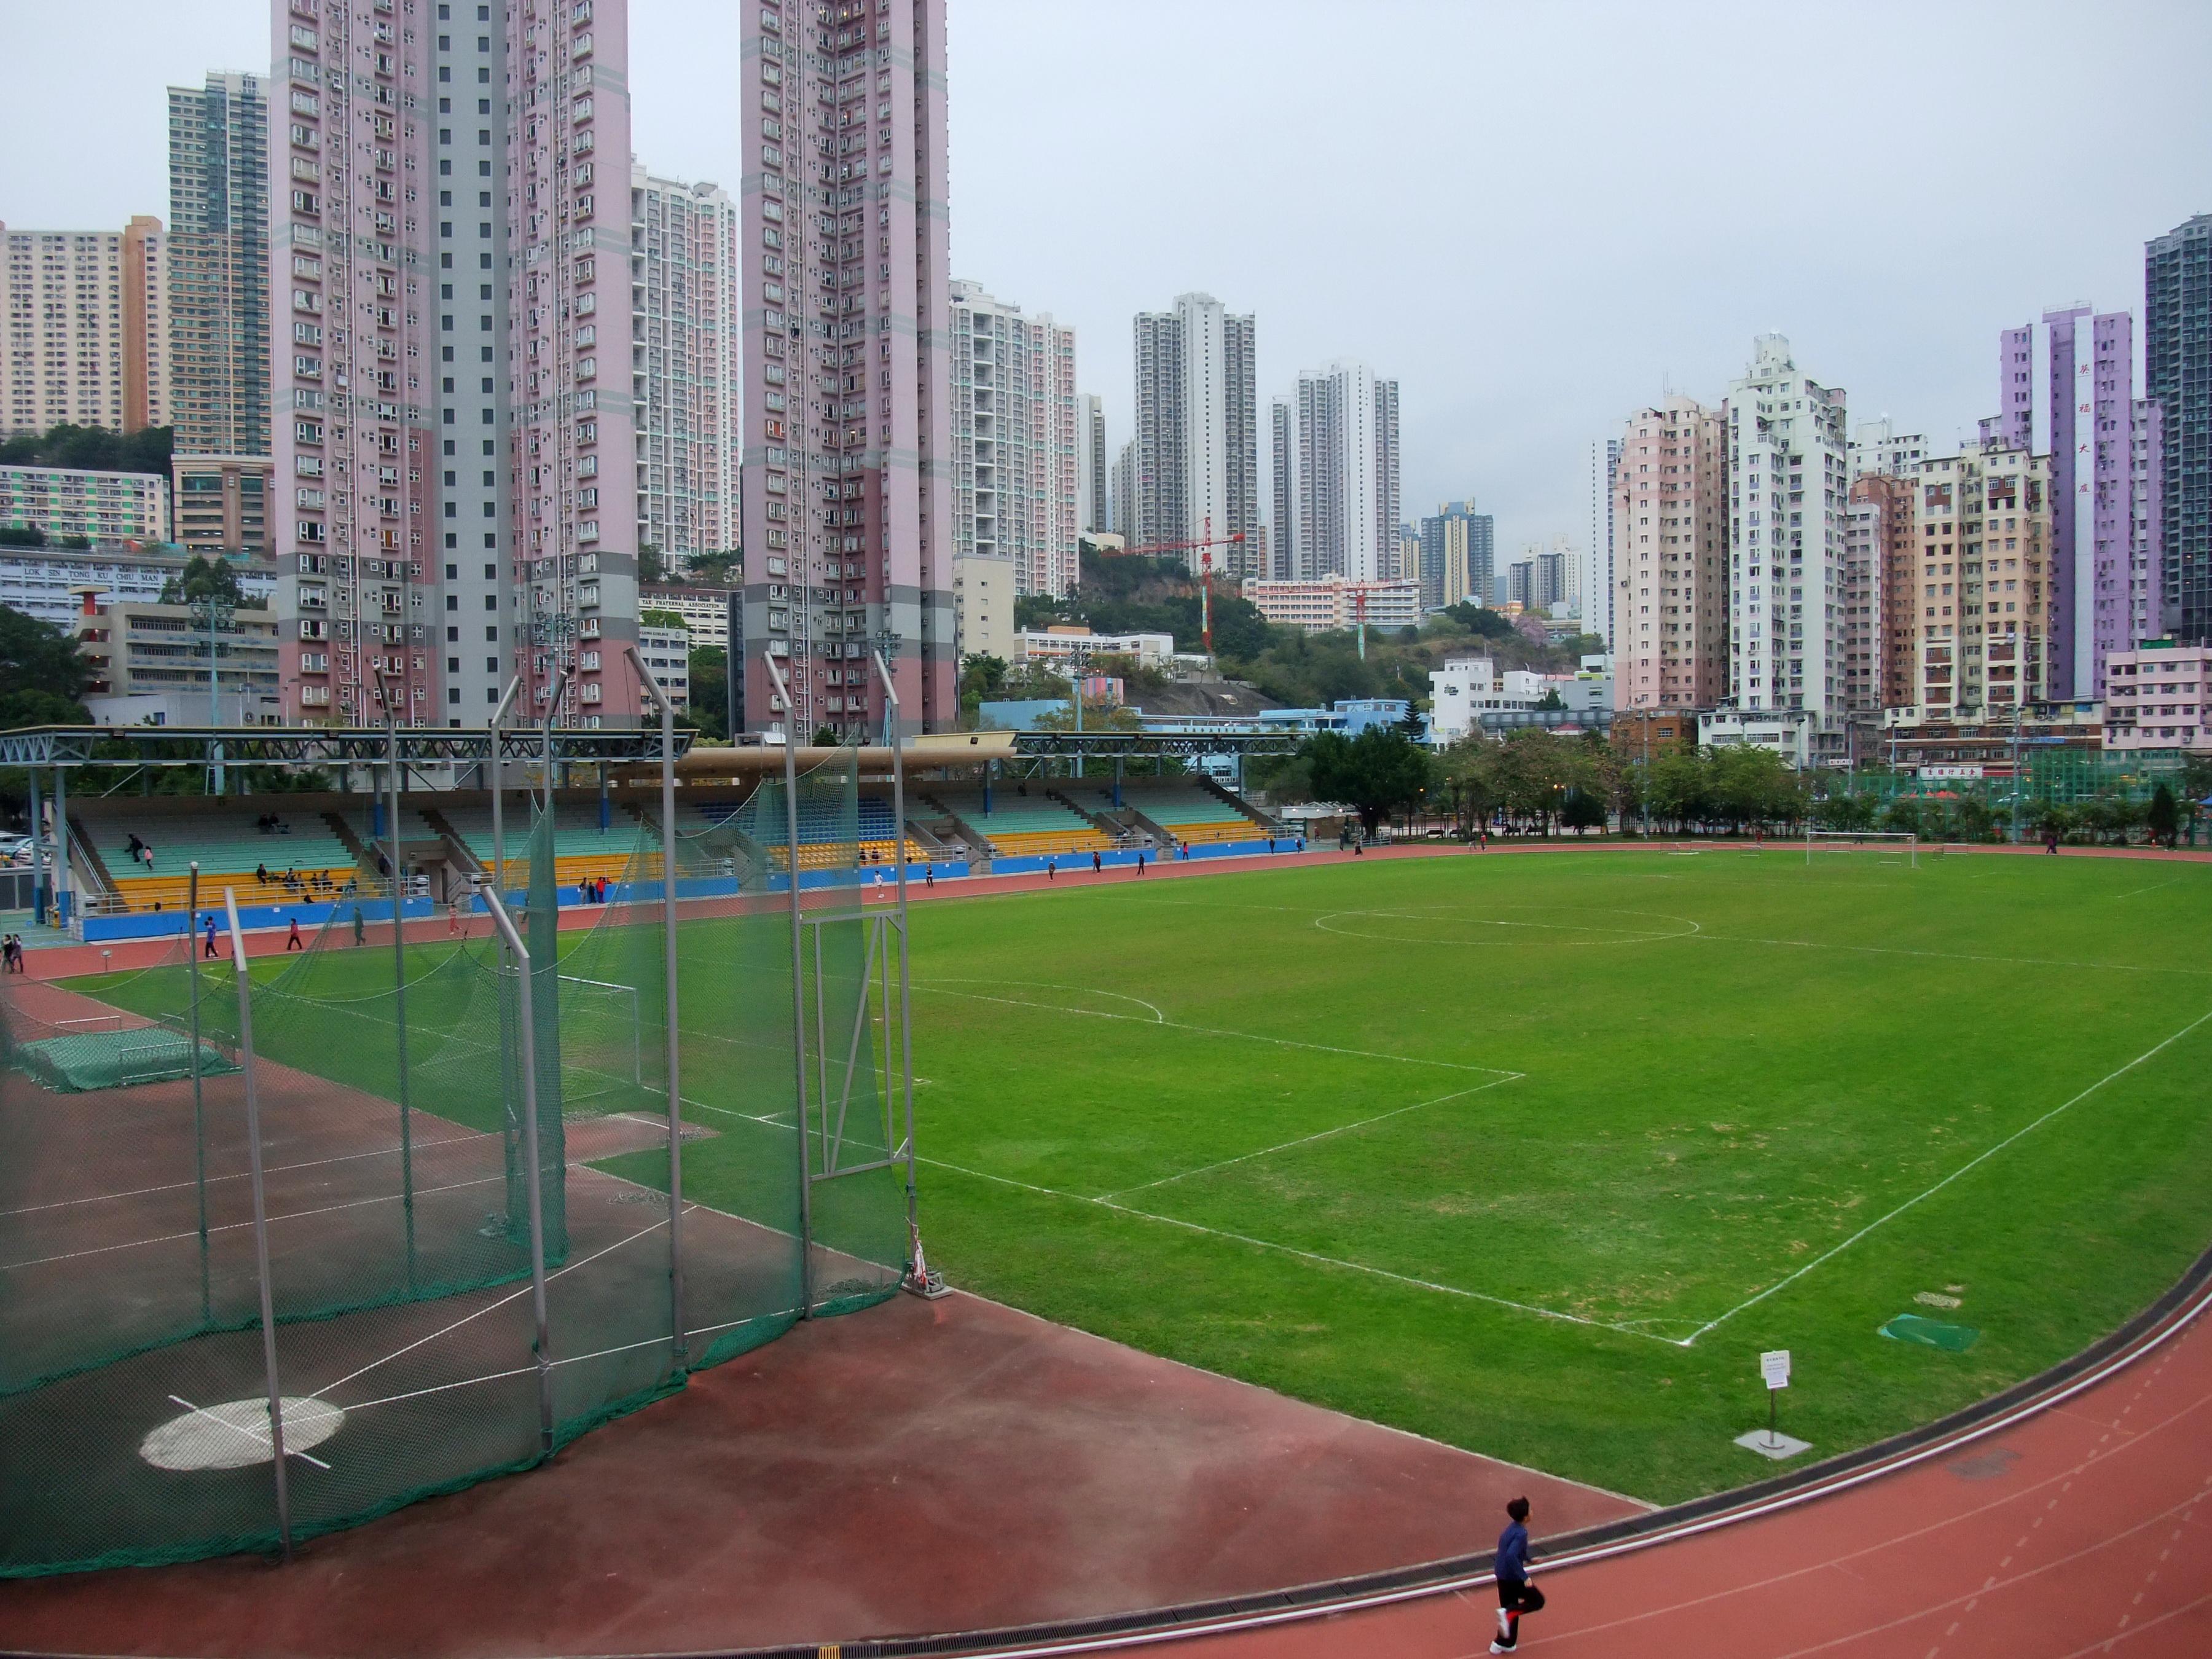 File:Kwai Chung Sports Ground (Hong Kong).jpg - Wikimedia Commons